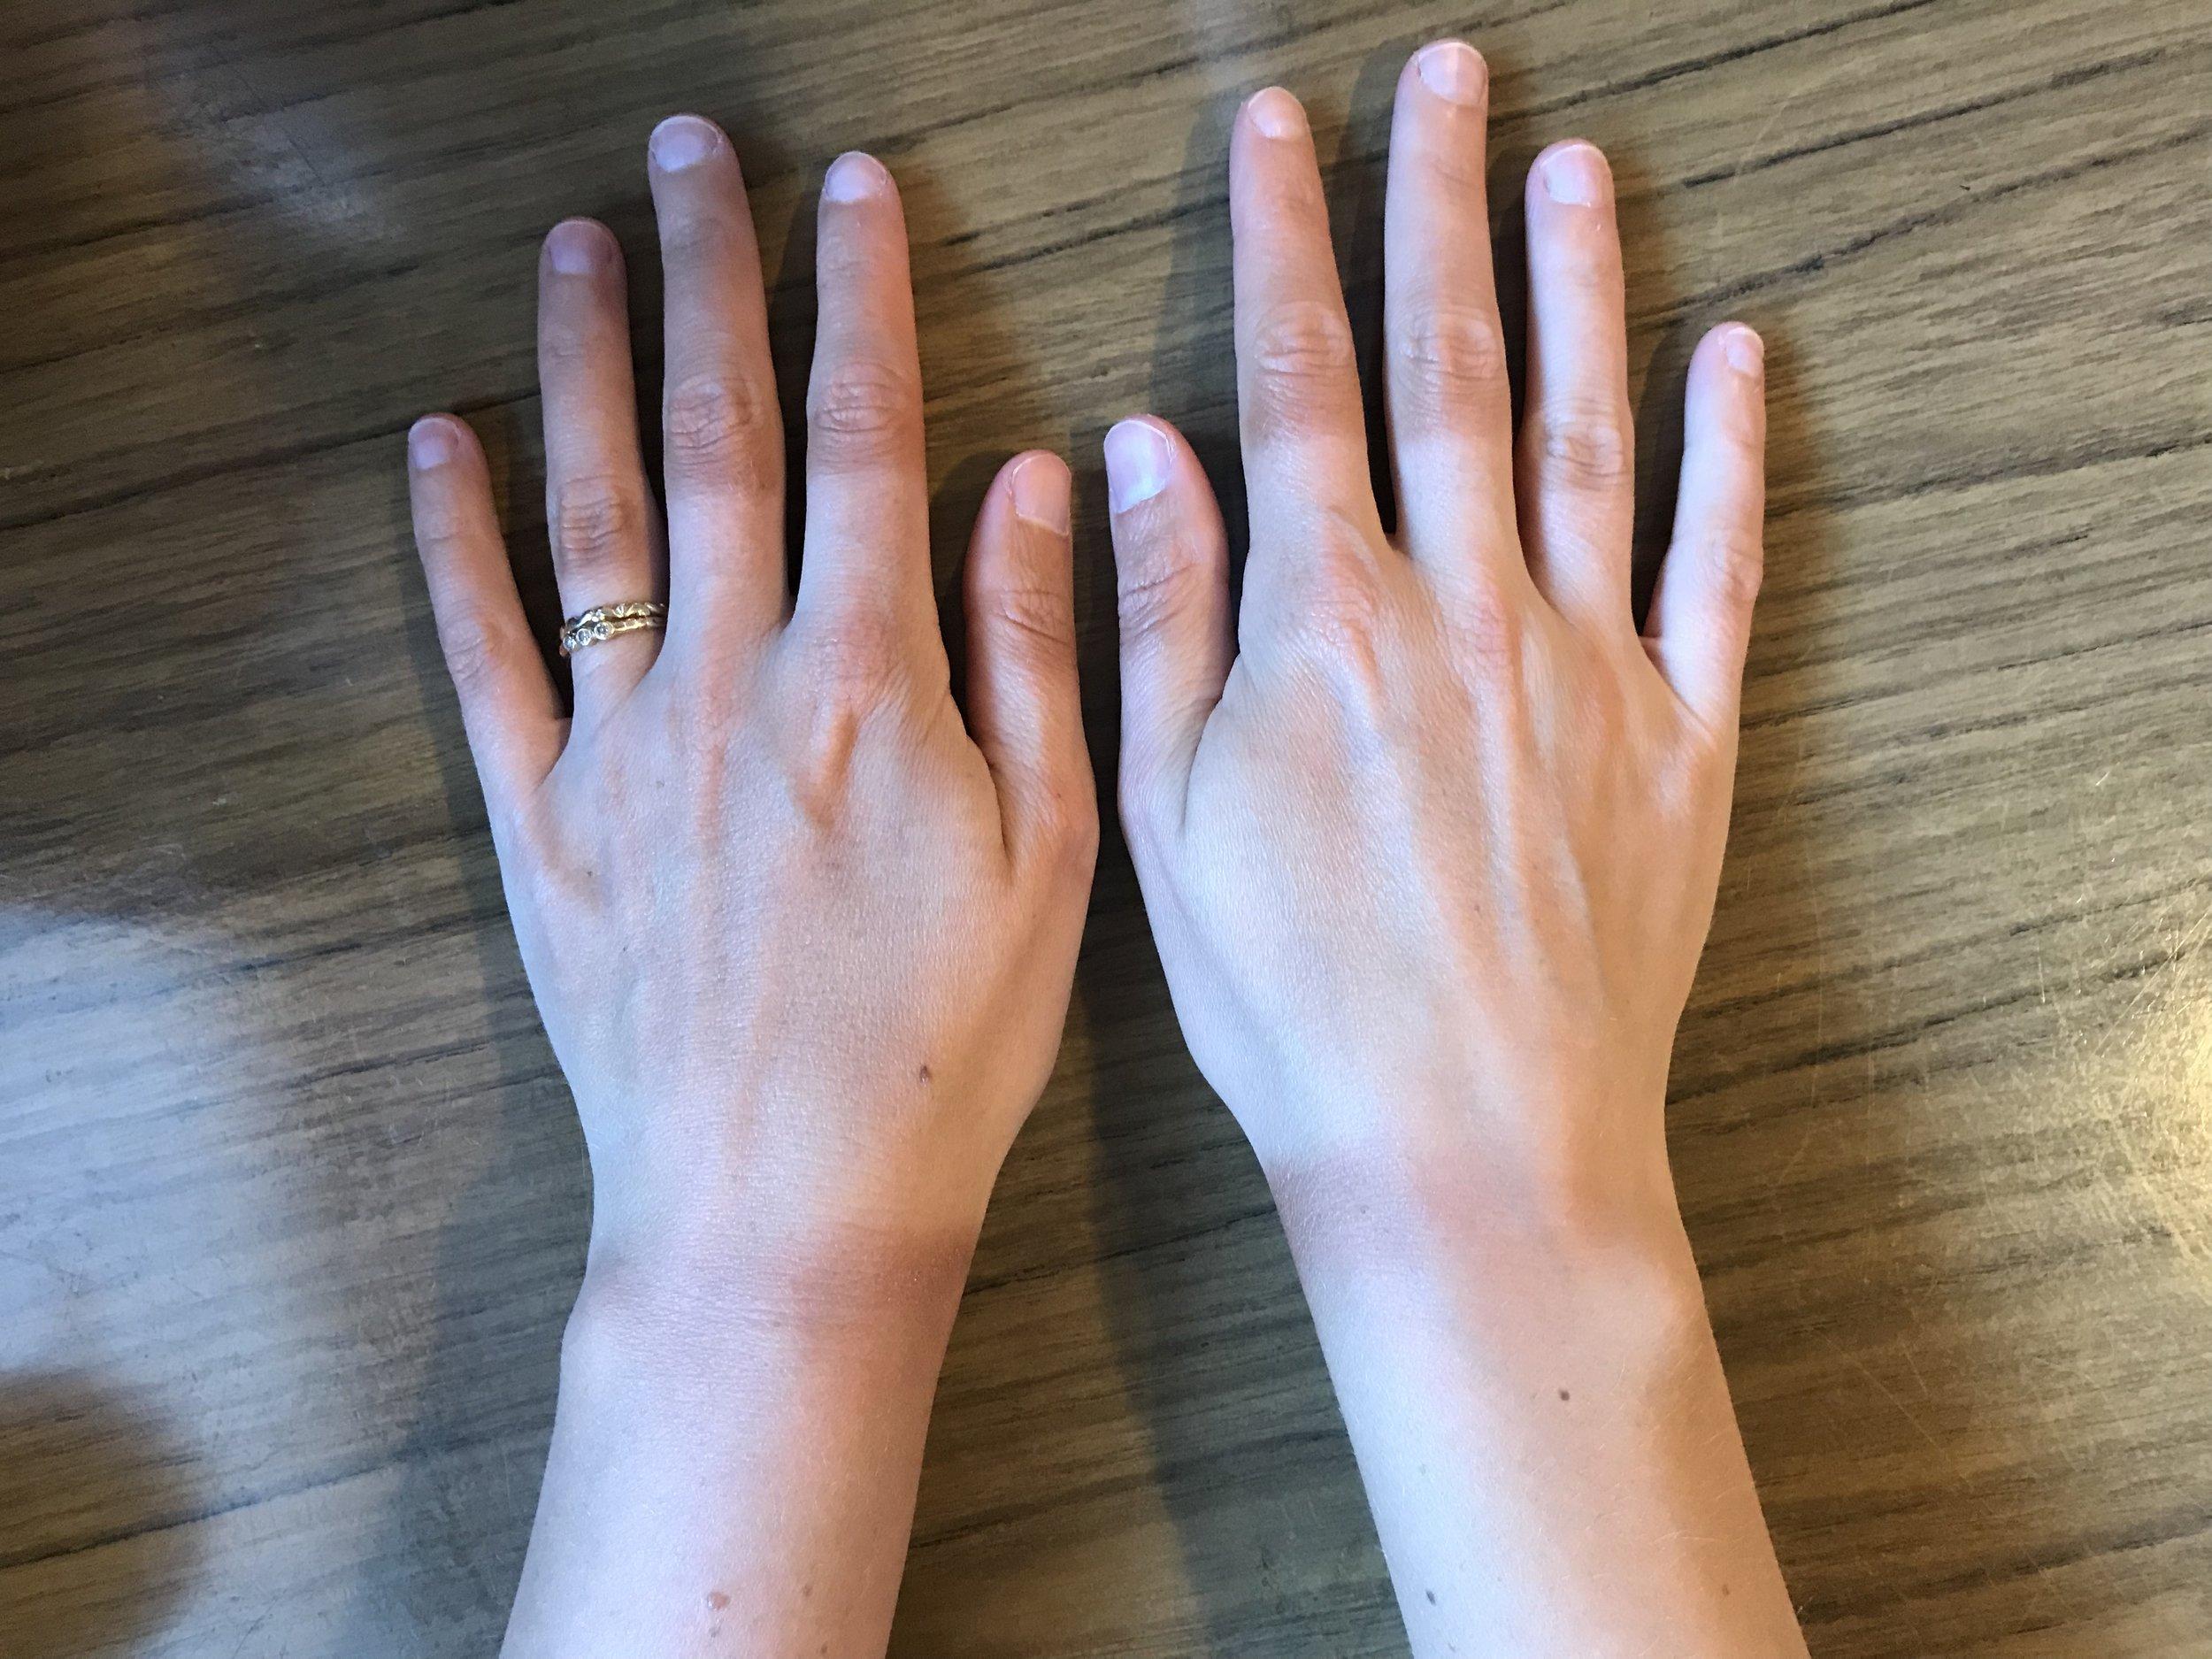 Demonstrating my classy bike glove tan lines.